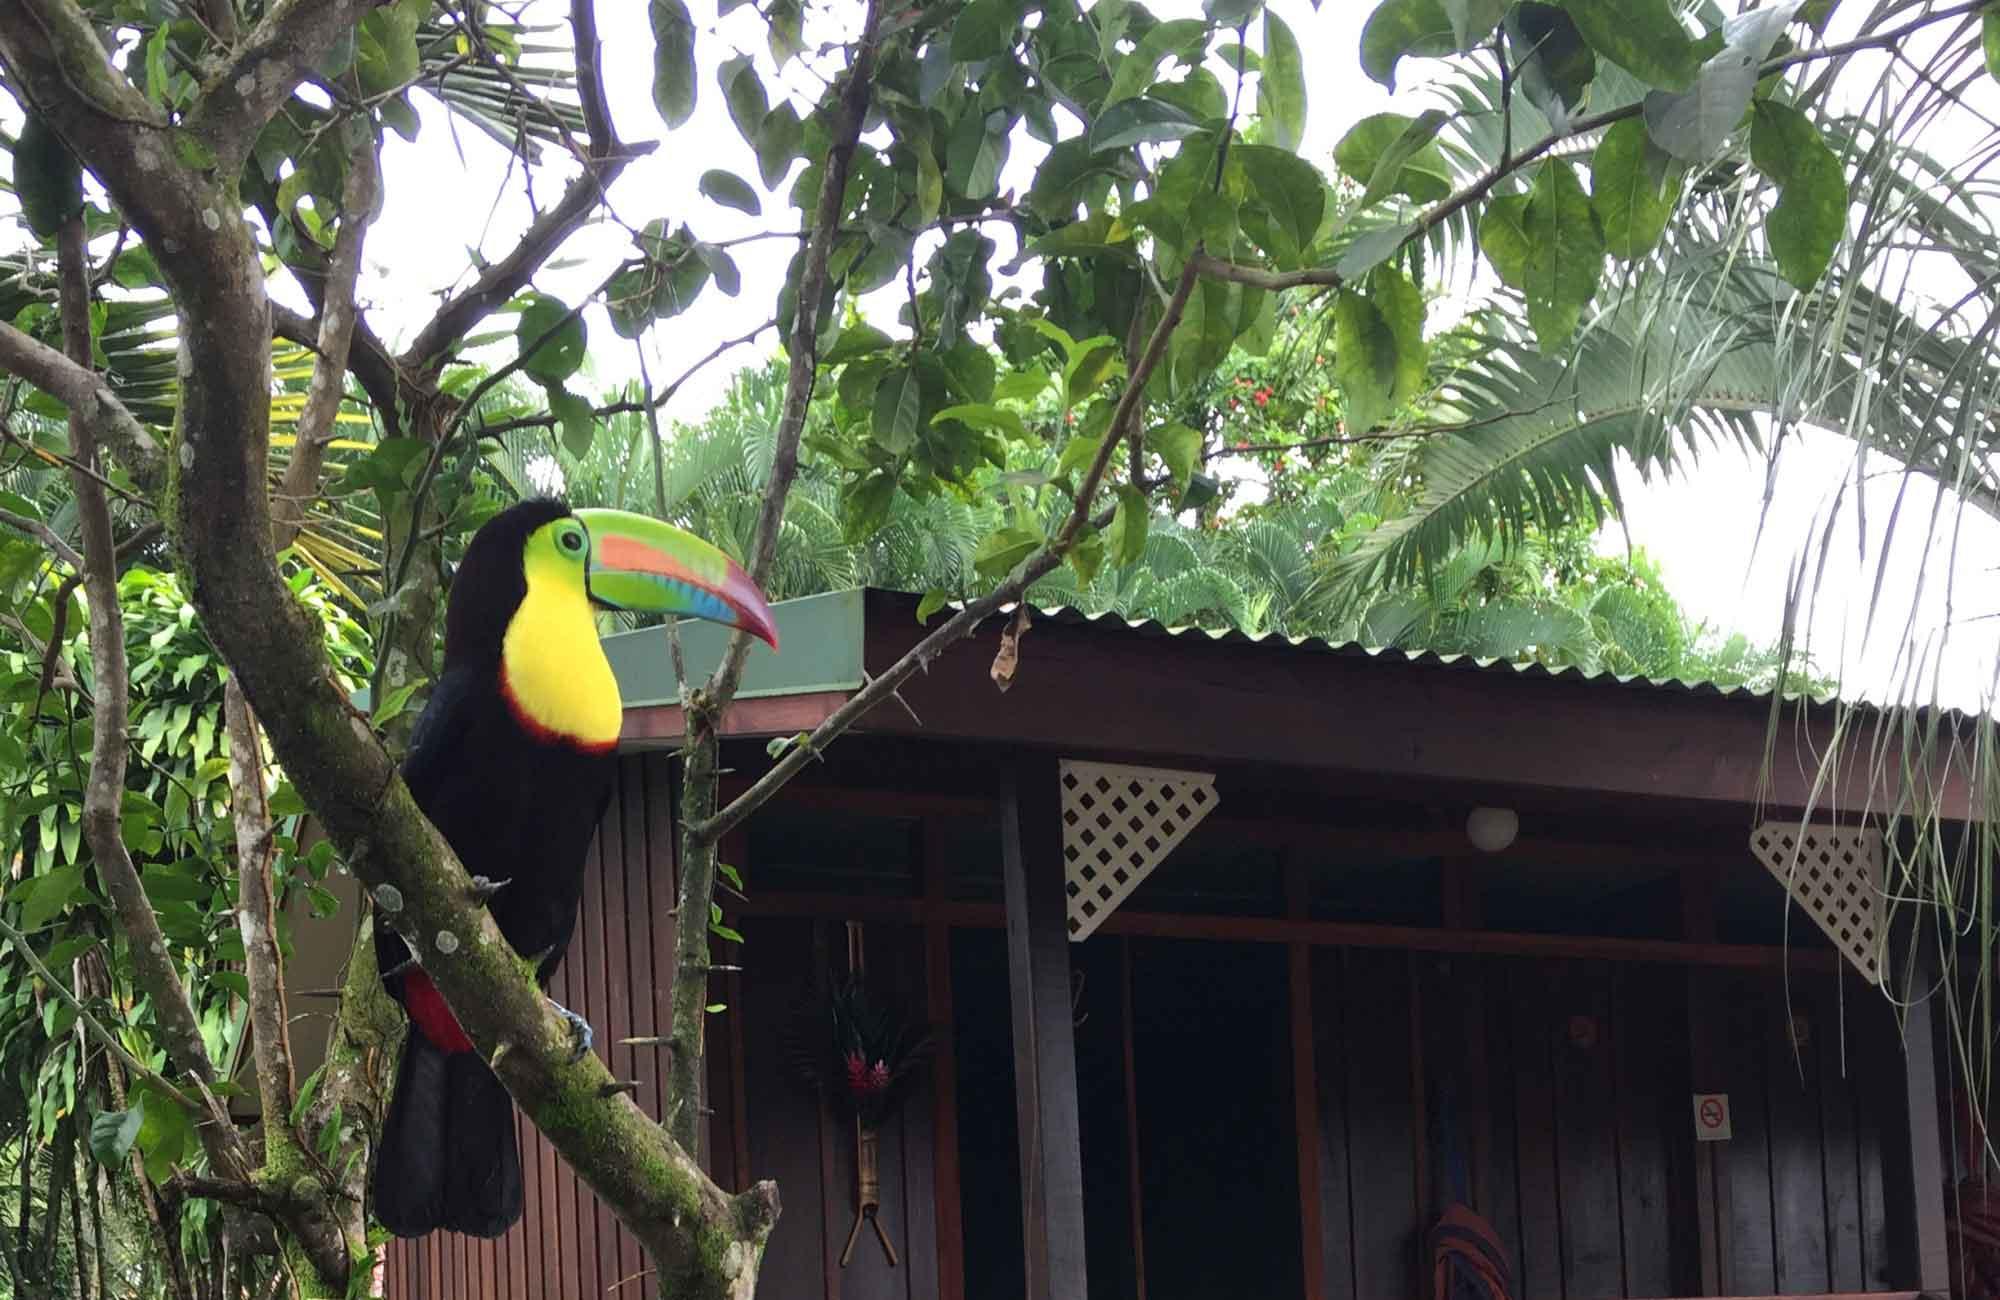 Voyage Costa Rica - Toucan - Amplitudes